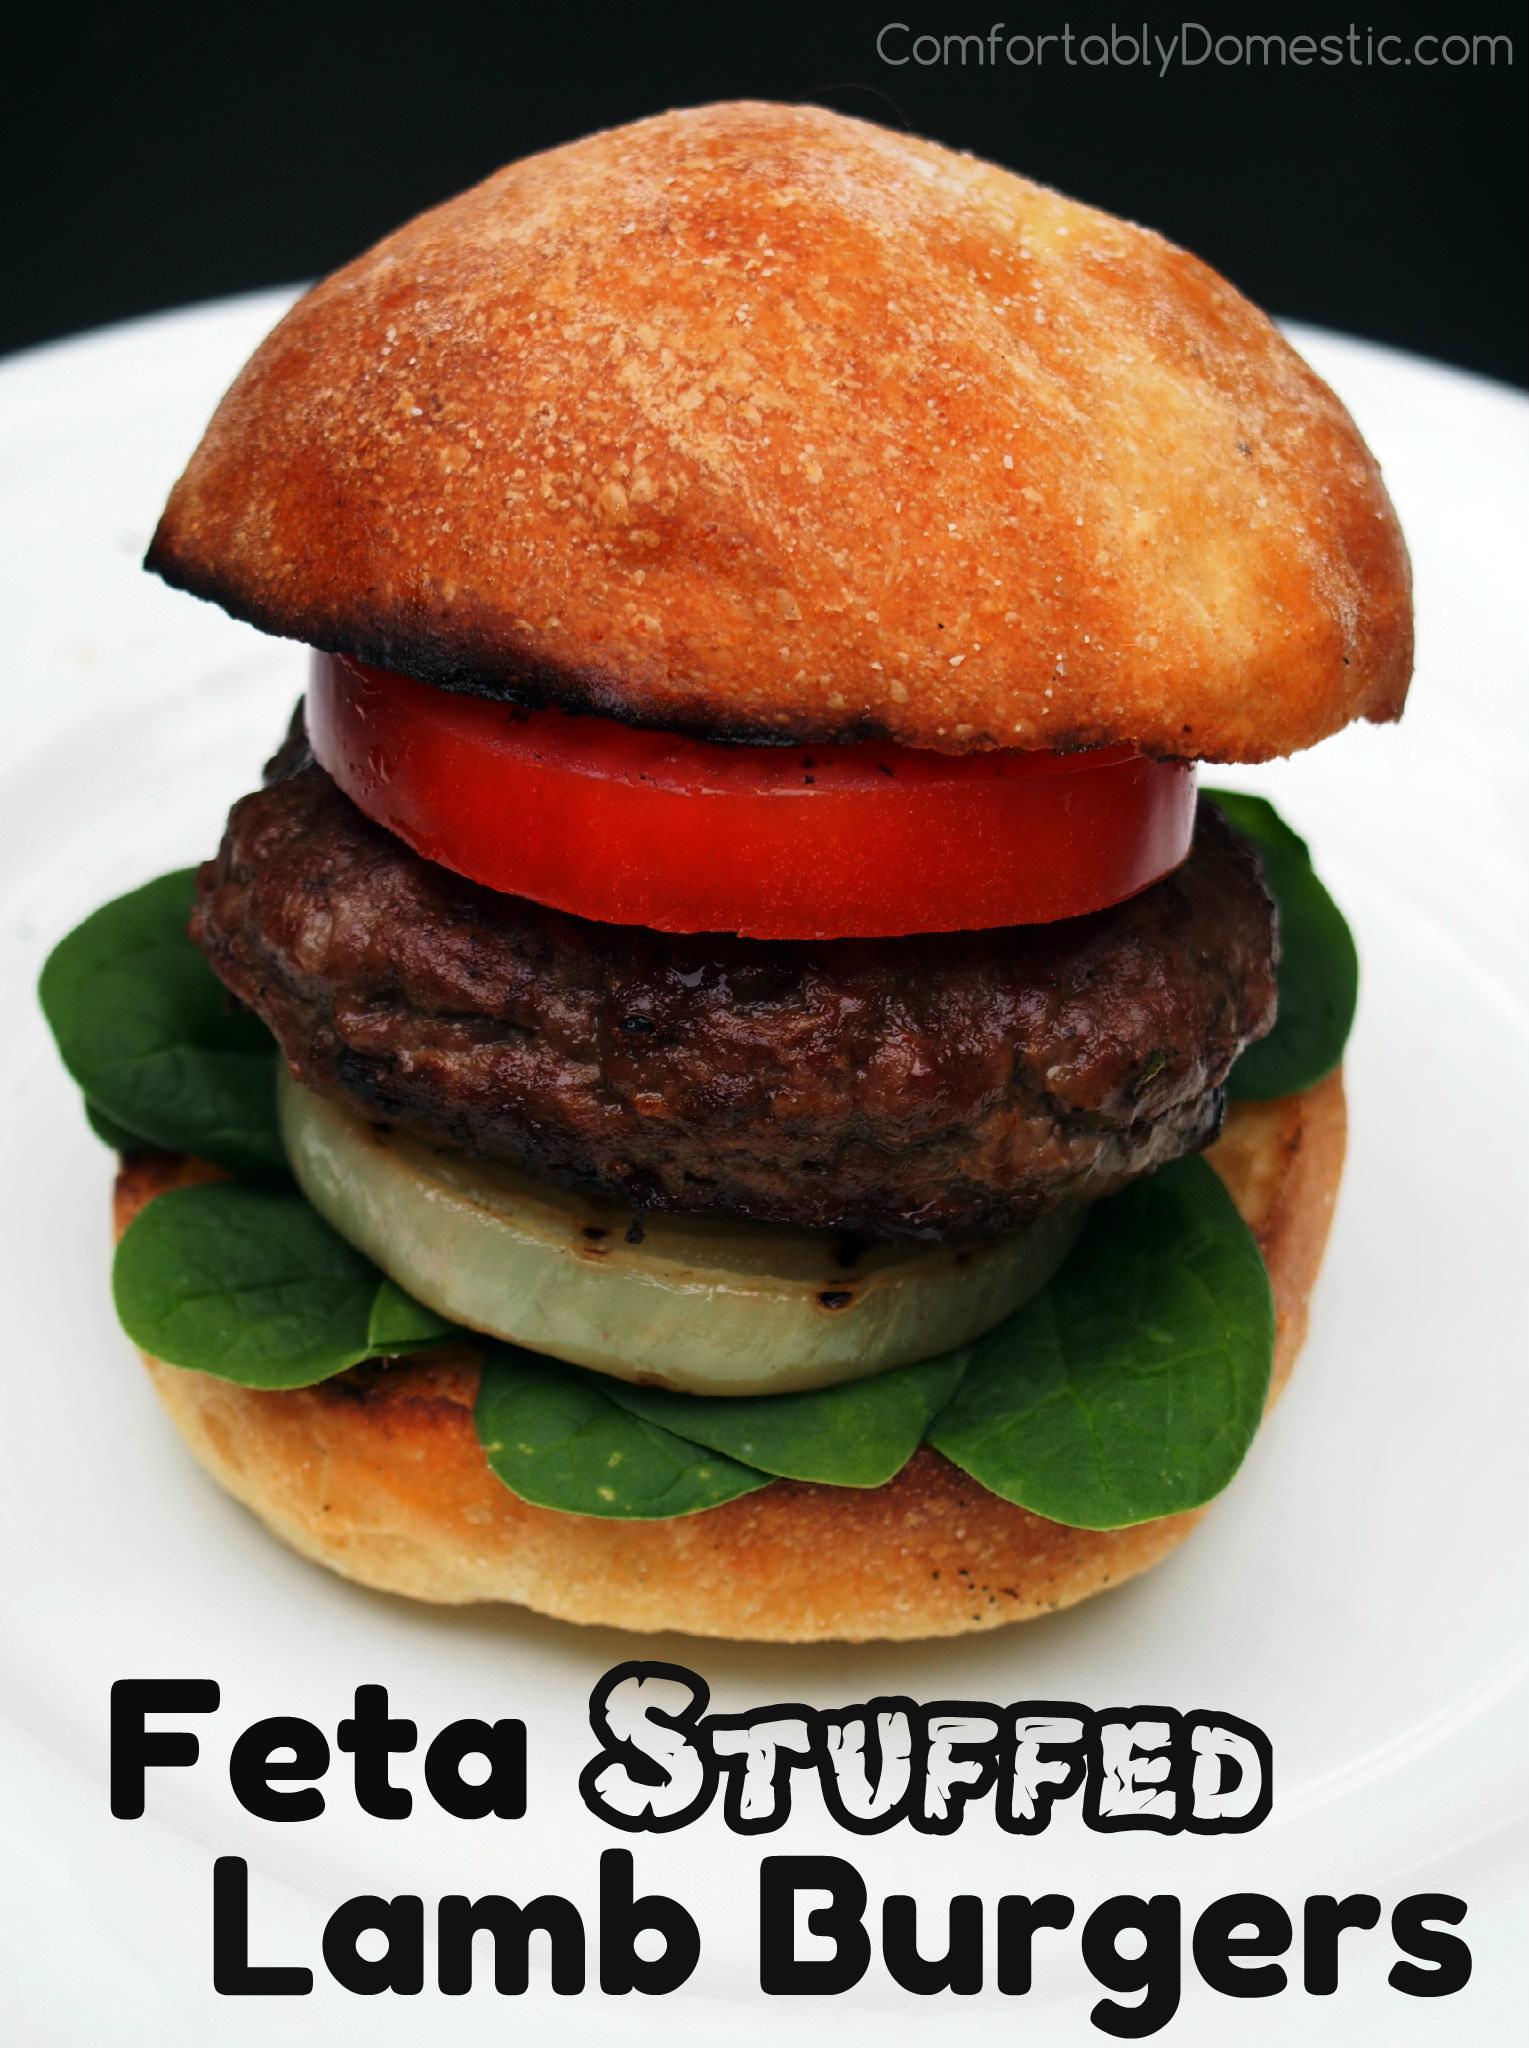 ... , but Feta Stuffed Lamb Burgers definitely deserve to be savored